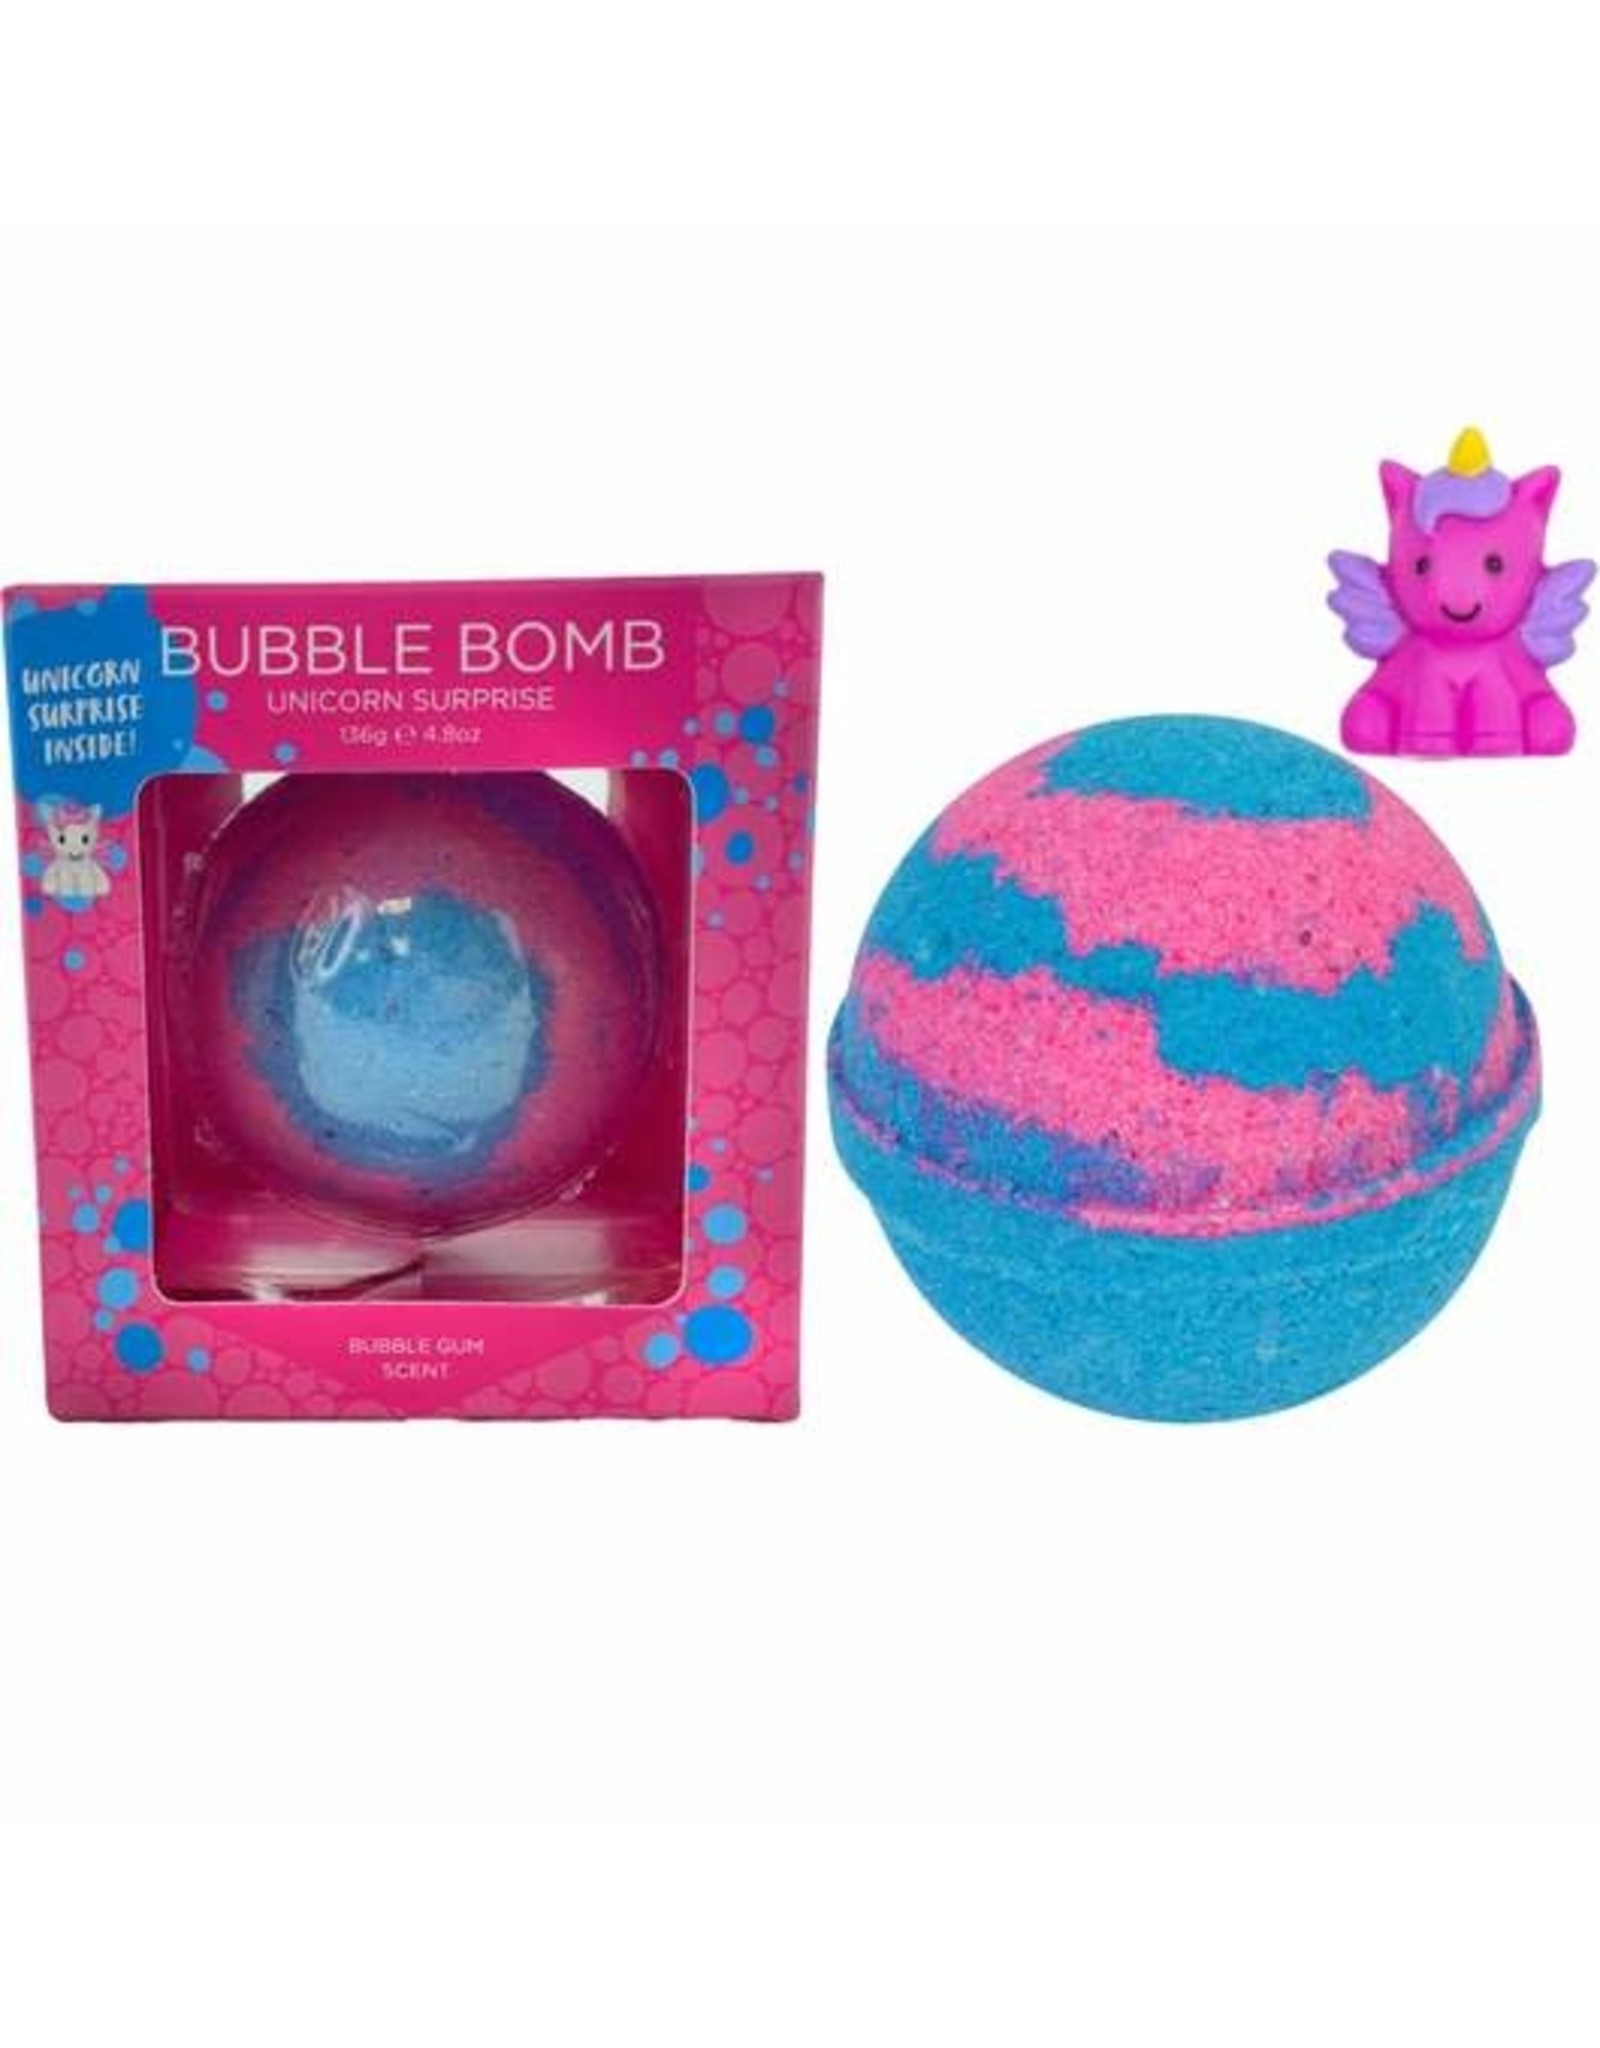 Two Sisters Spa Two Sisters Spa - Unicorn Squishy Bubble Bath Bomb